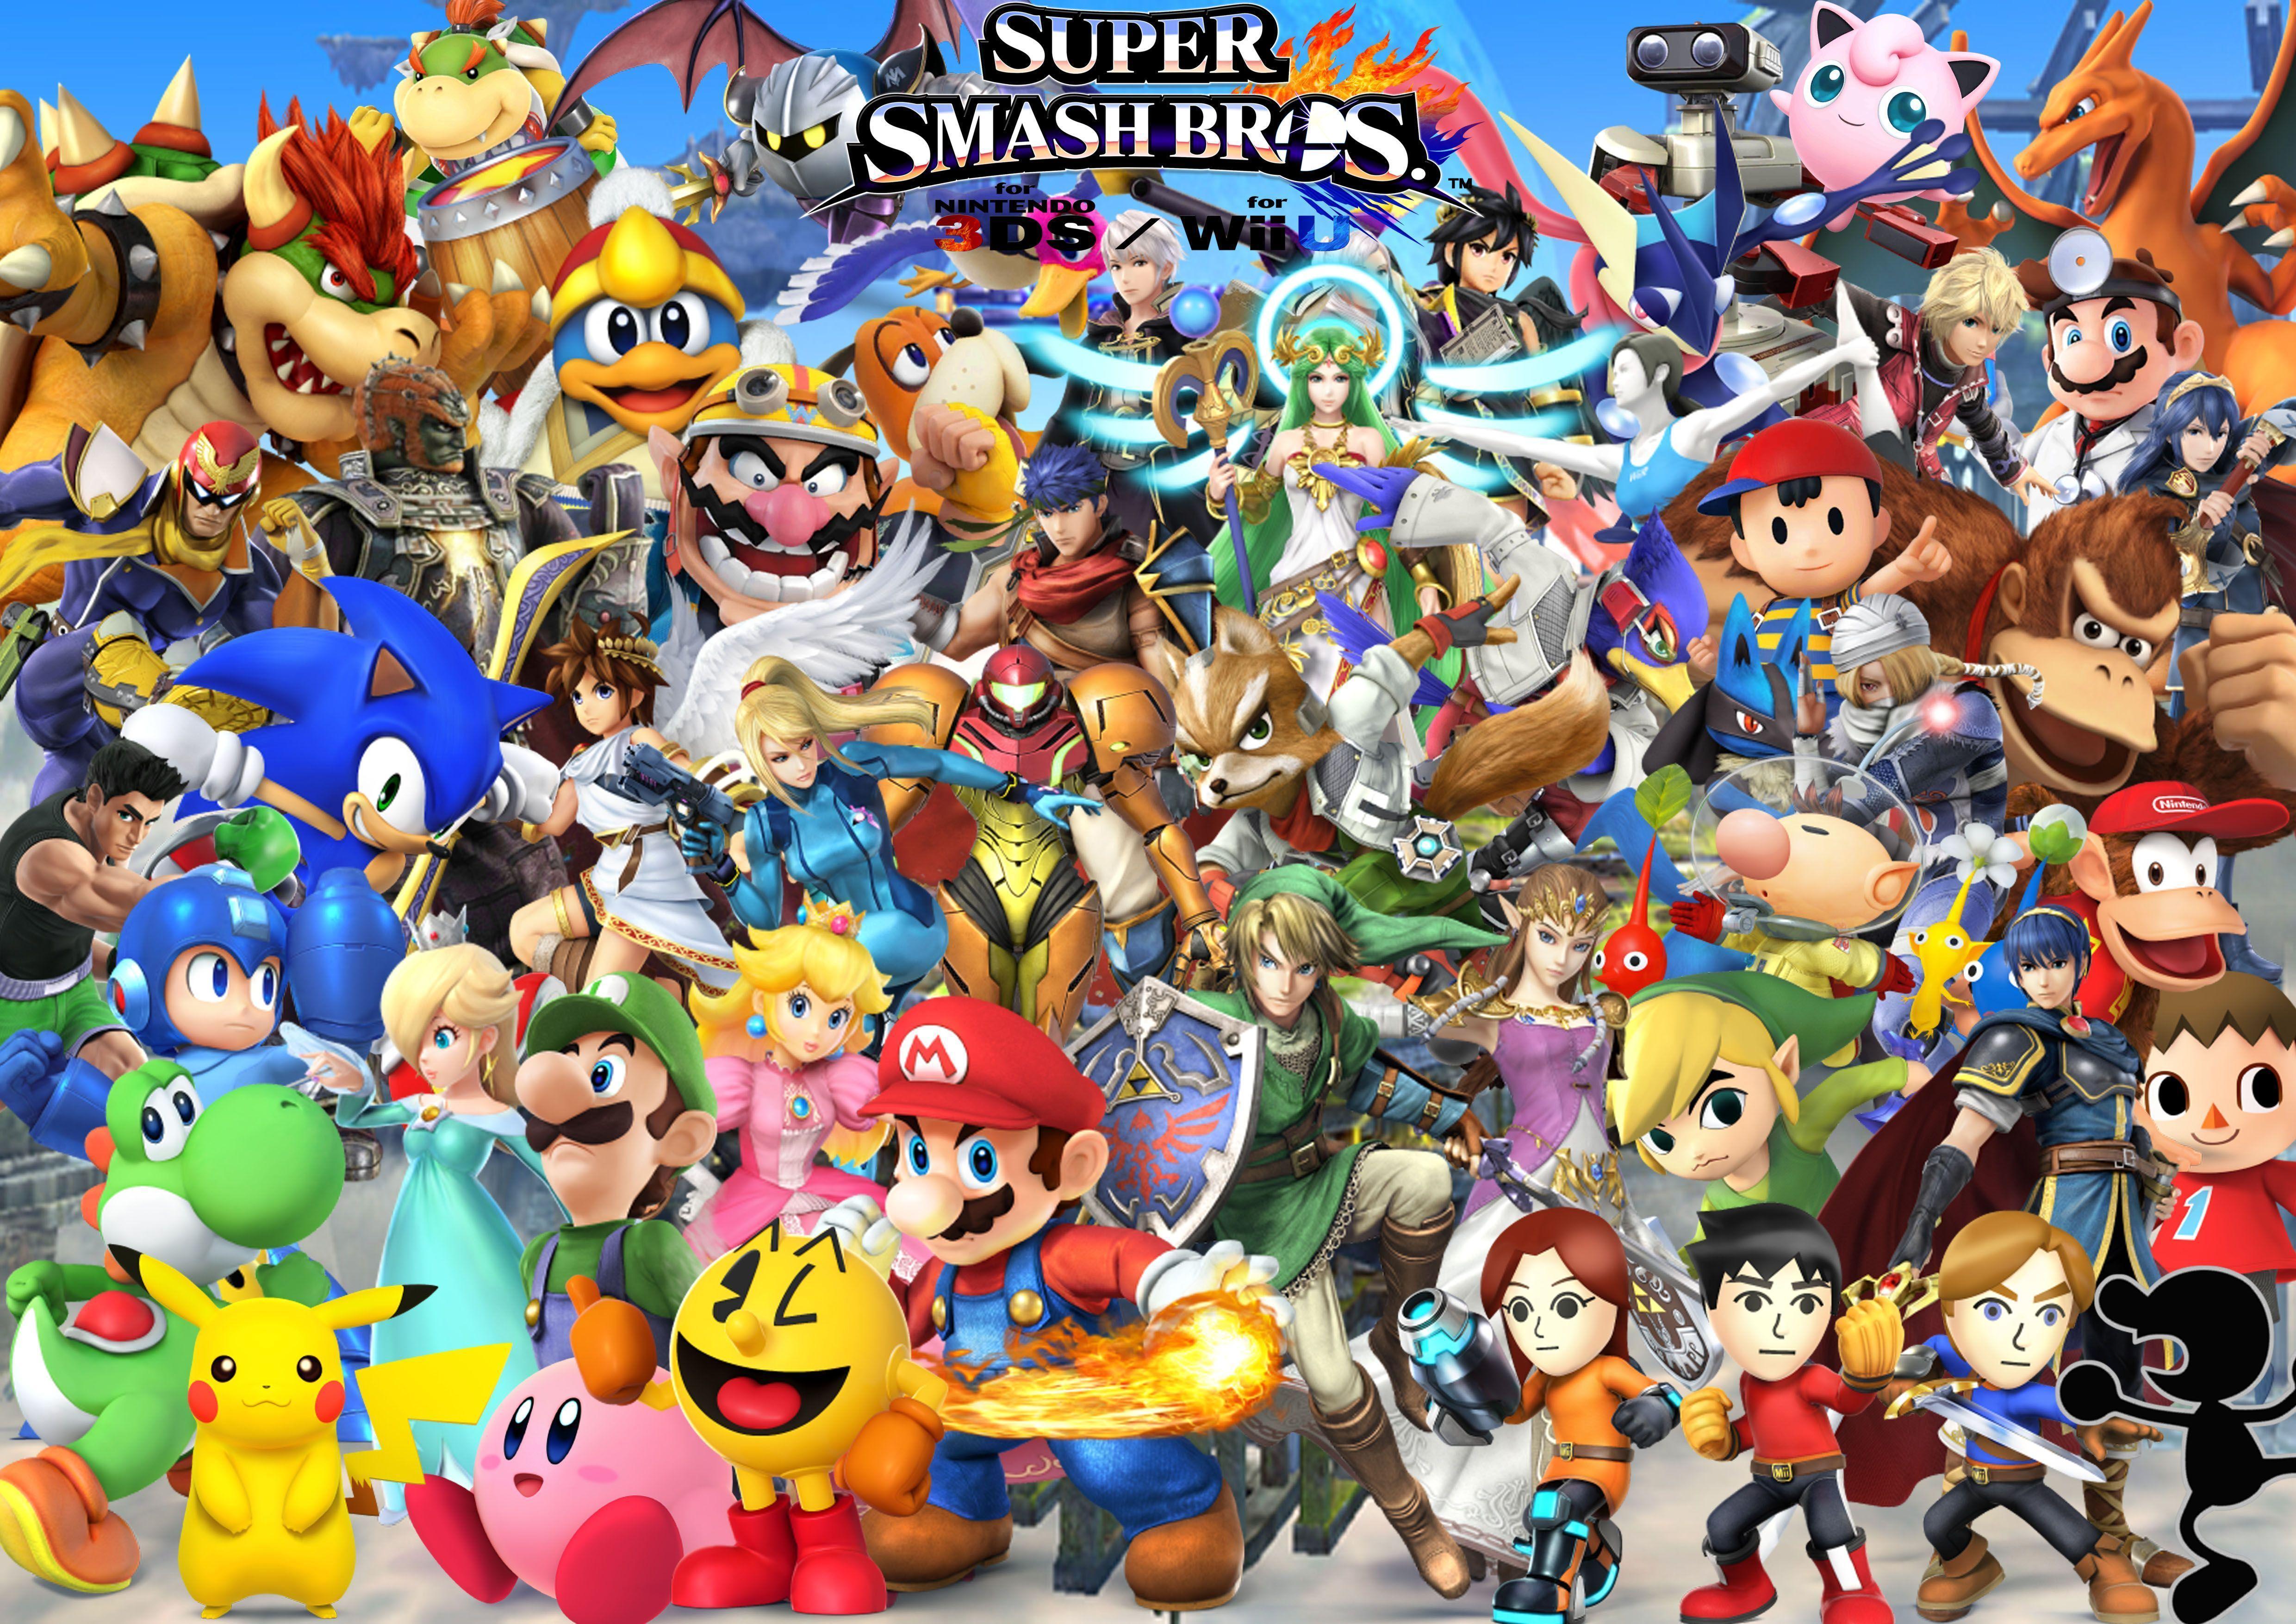 Super Smash Bros Ultimate Wallpapers Top Free Super Smash